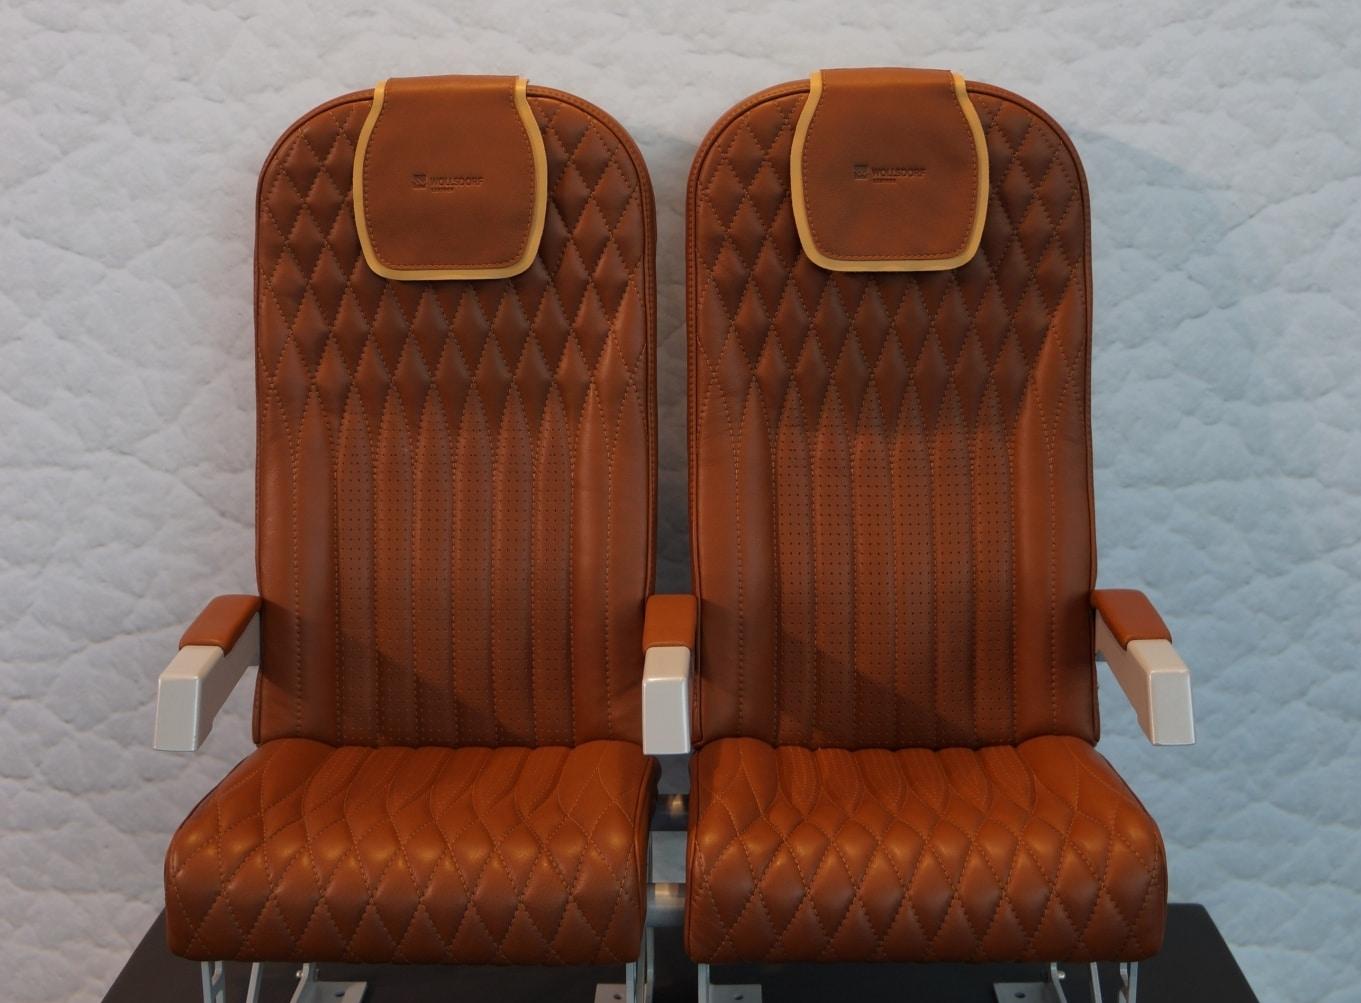 Aircraft seats sewing expertise of Wollsdorf